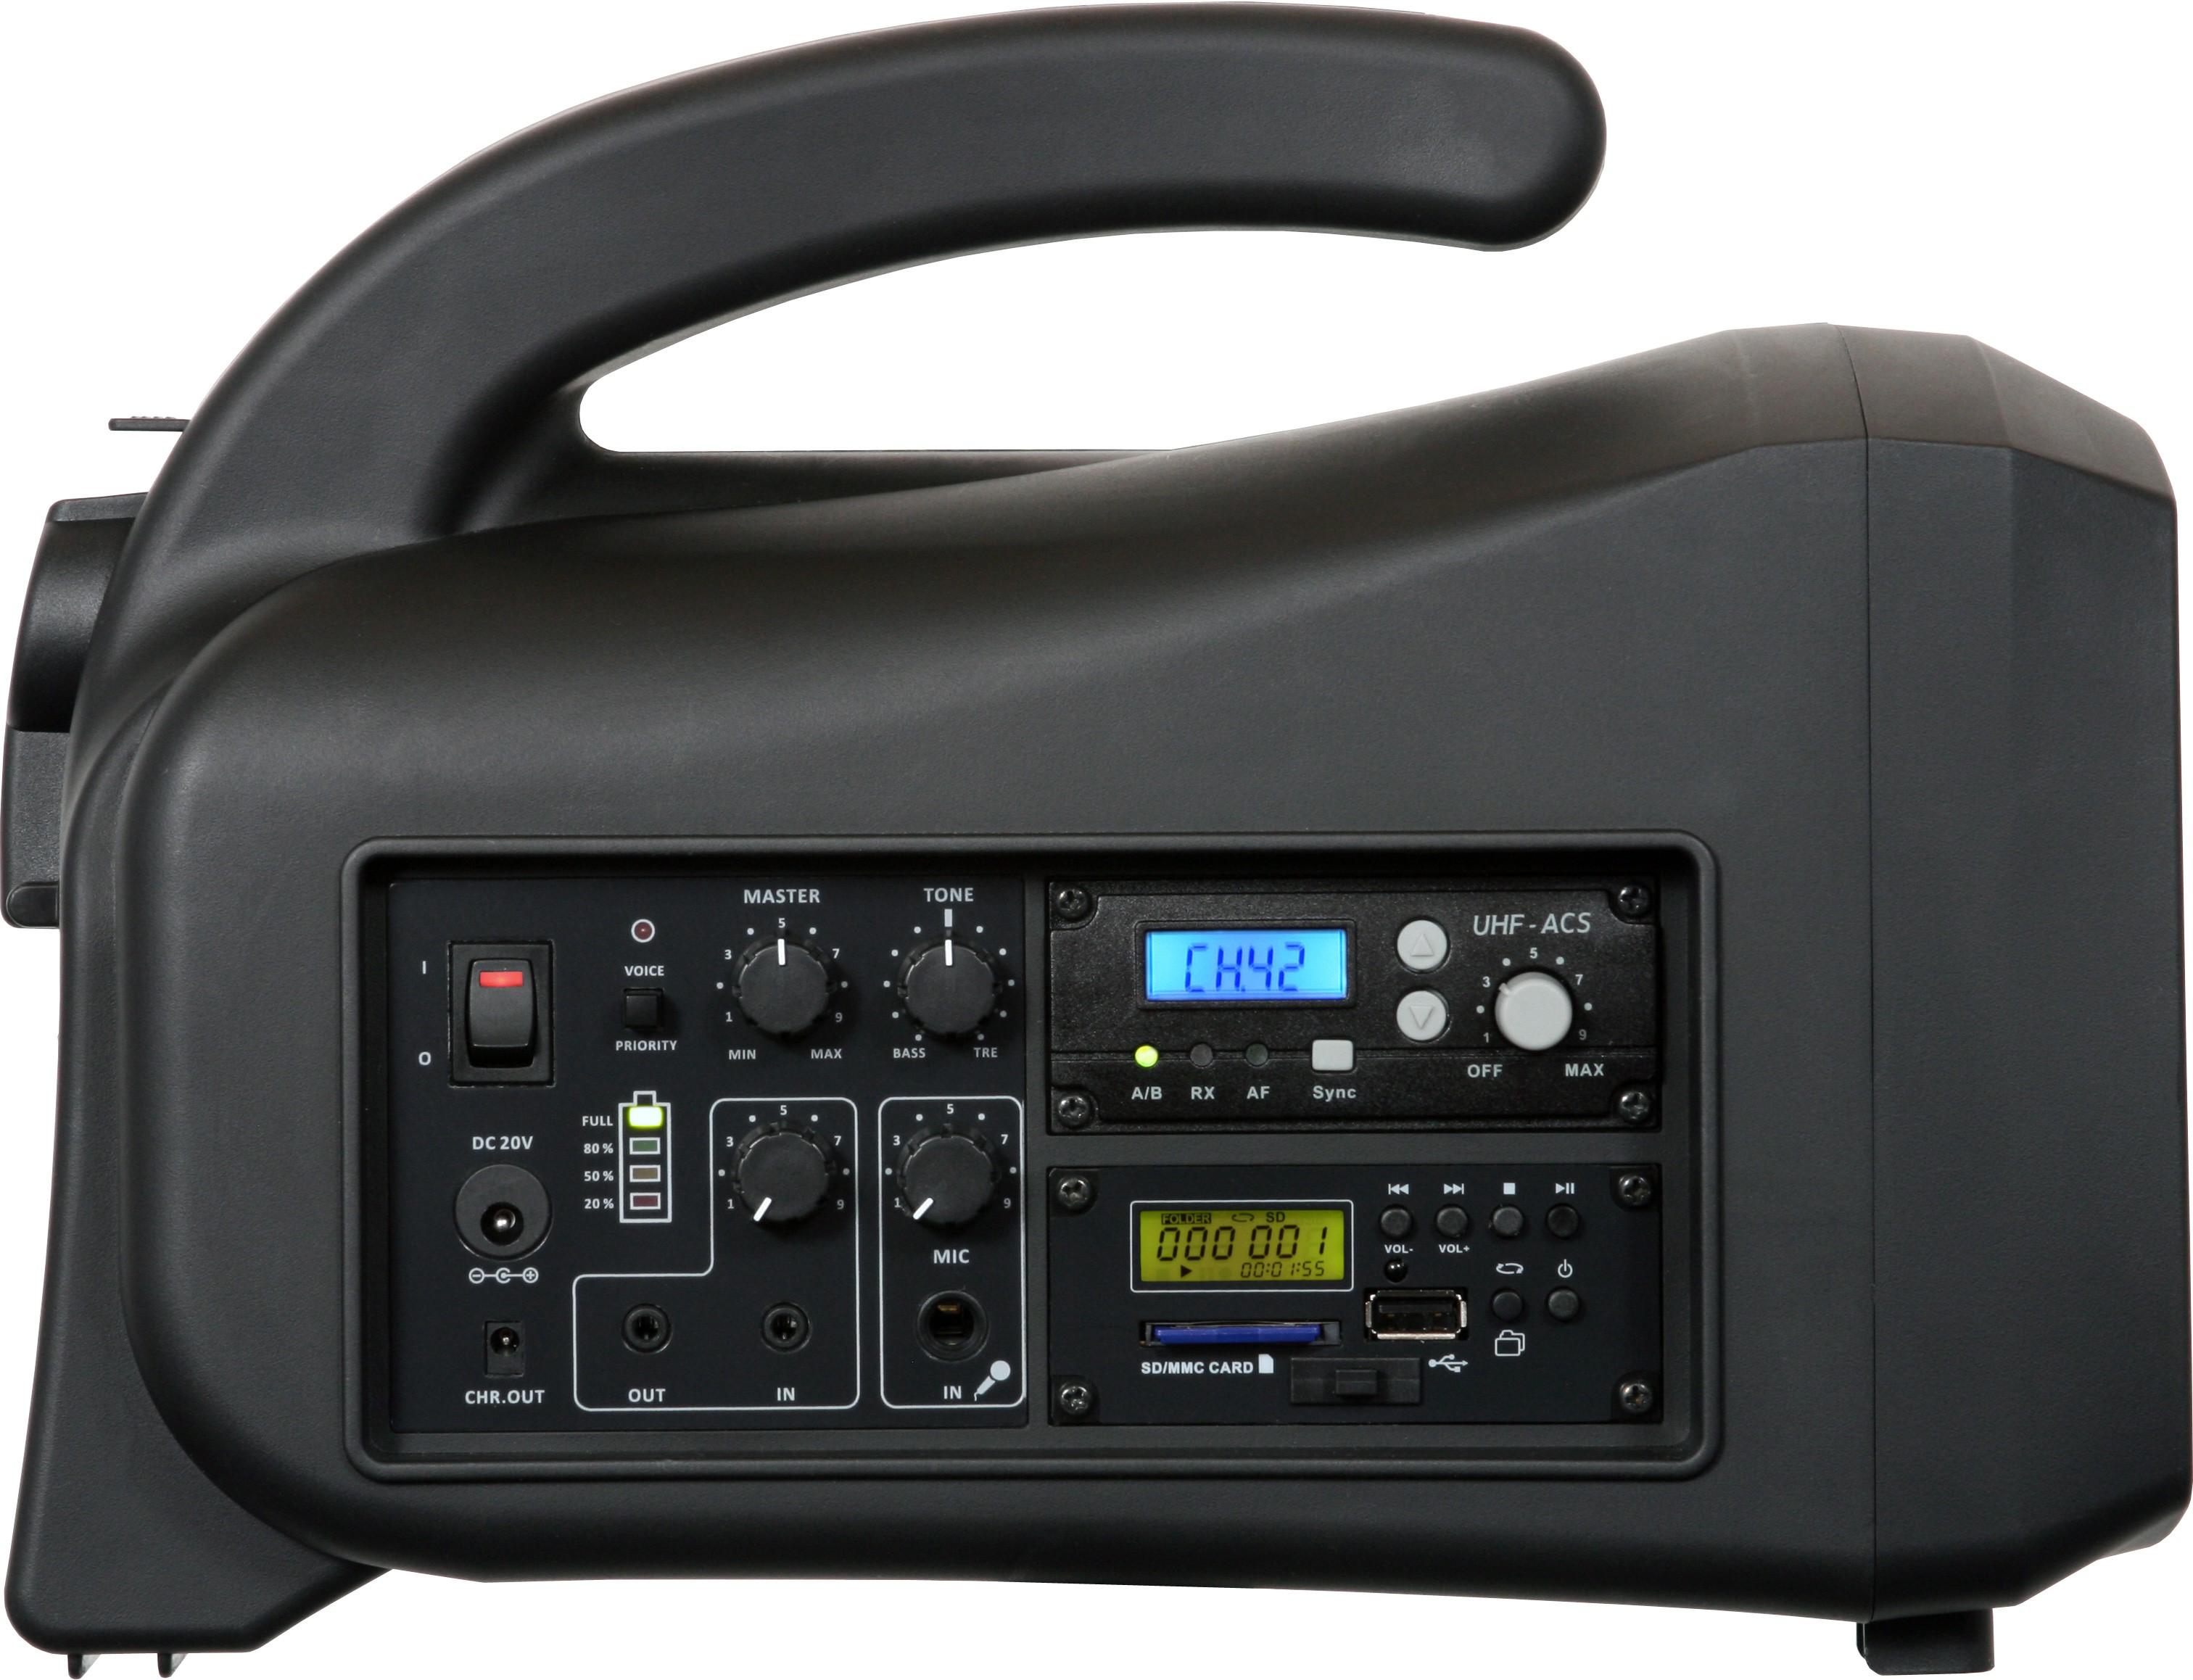 TV5X ControlPanel Side